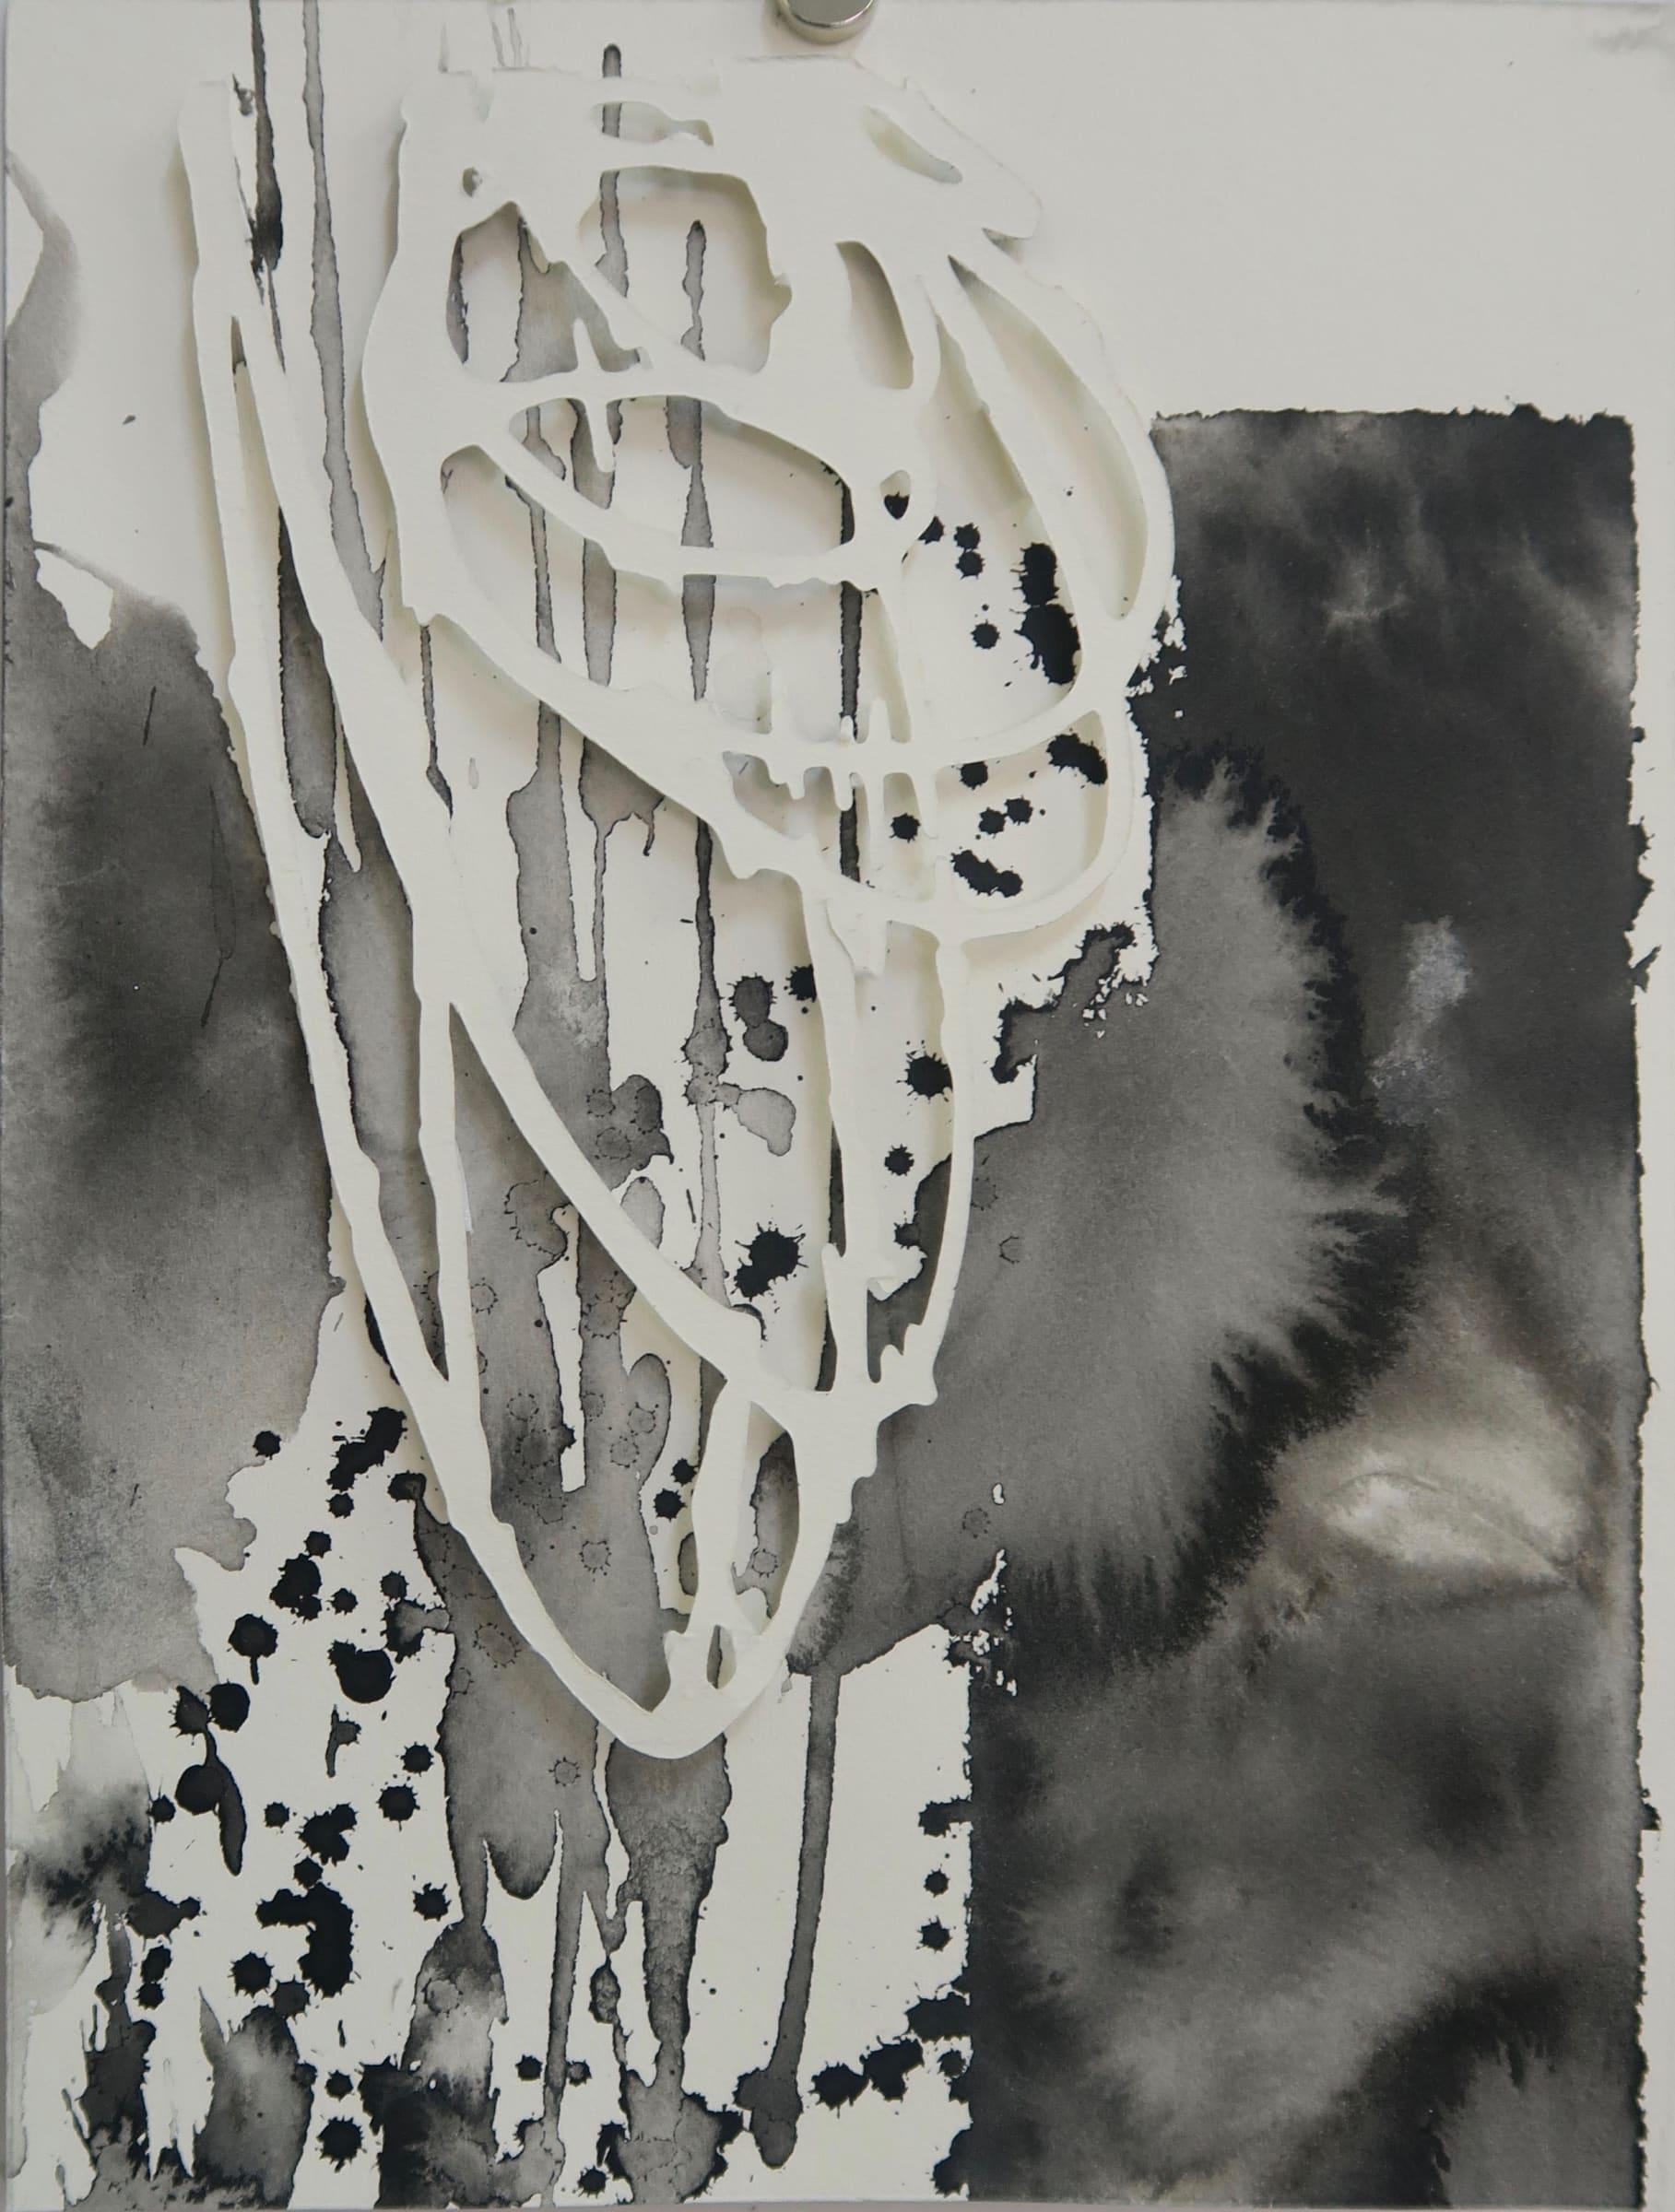 <span class=&#34;link fancybox-details-link&#34;><a href=&#34;/artists/106-fatima-tayob-moosa/works/2522-fatima-tayob-moosa-day-29-2018/&#34;>View Detail Page</a></span><div class=&#34;artist&#34;><strong>Fatima Tayob Moosa</strong></div> <div class=&#34;title&#34;><em>Day 29</em>, 2018</div> <div class=&#34;medium&#34;>Ink On Fabriano</div> <div class=&#34;dimensions&#34;>21cm x 16cm</div><div class=&#34;price&#34;>R600.00</div>